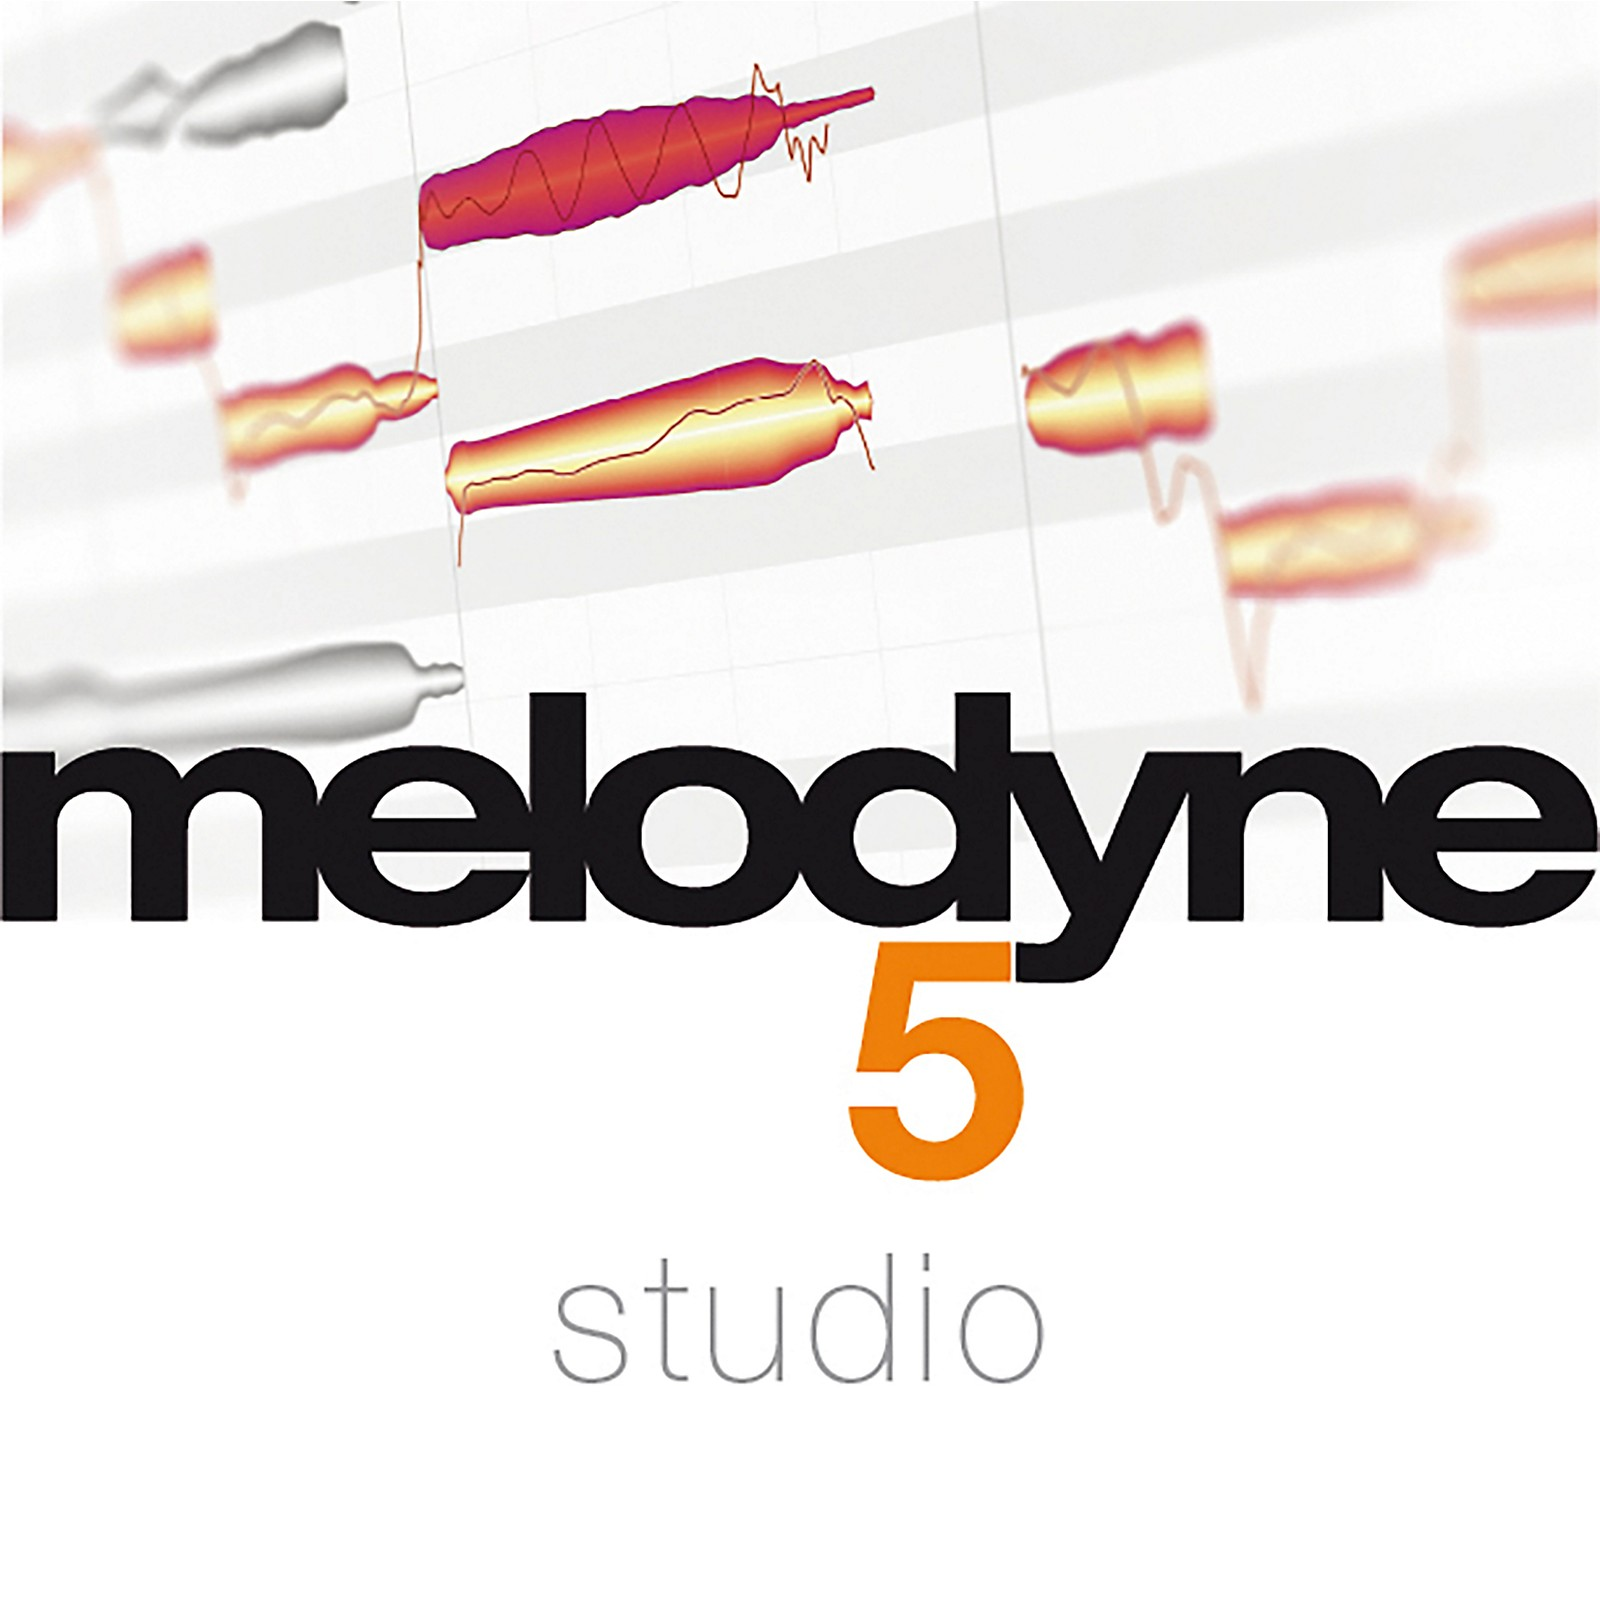 Celemony Melodyne 5 Studio from Assistant 4 (Software Download)